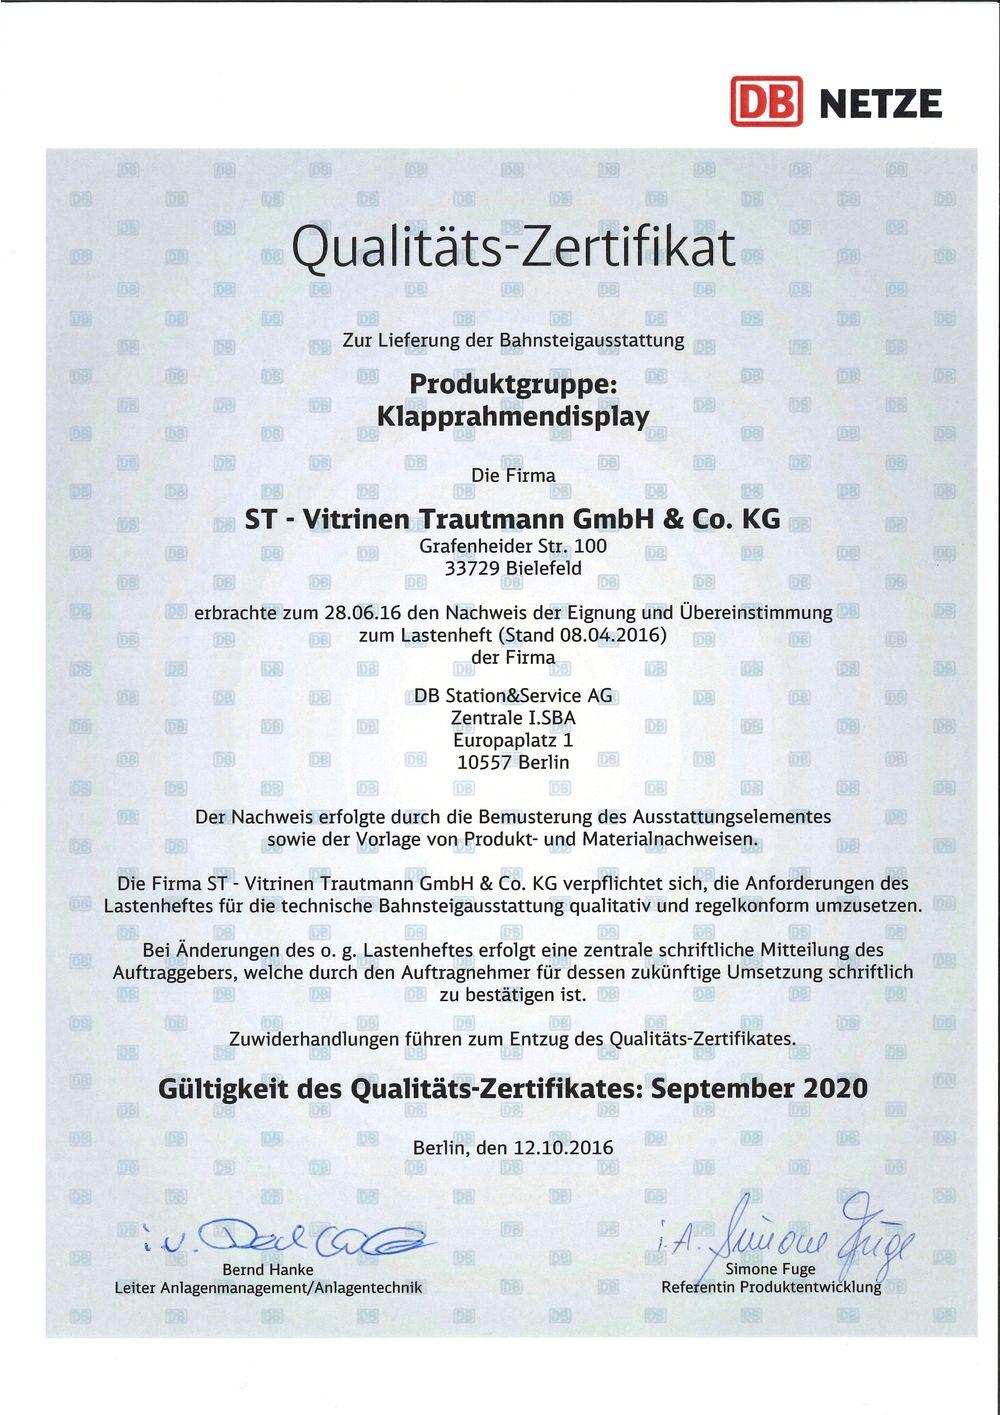 DEUTSCHE BAHN | Qualitätszertifikate - ST-Vitrinen